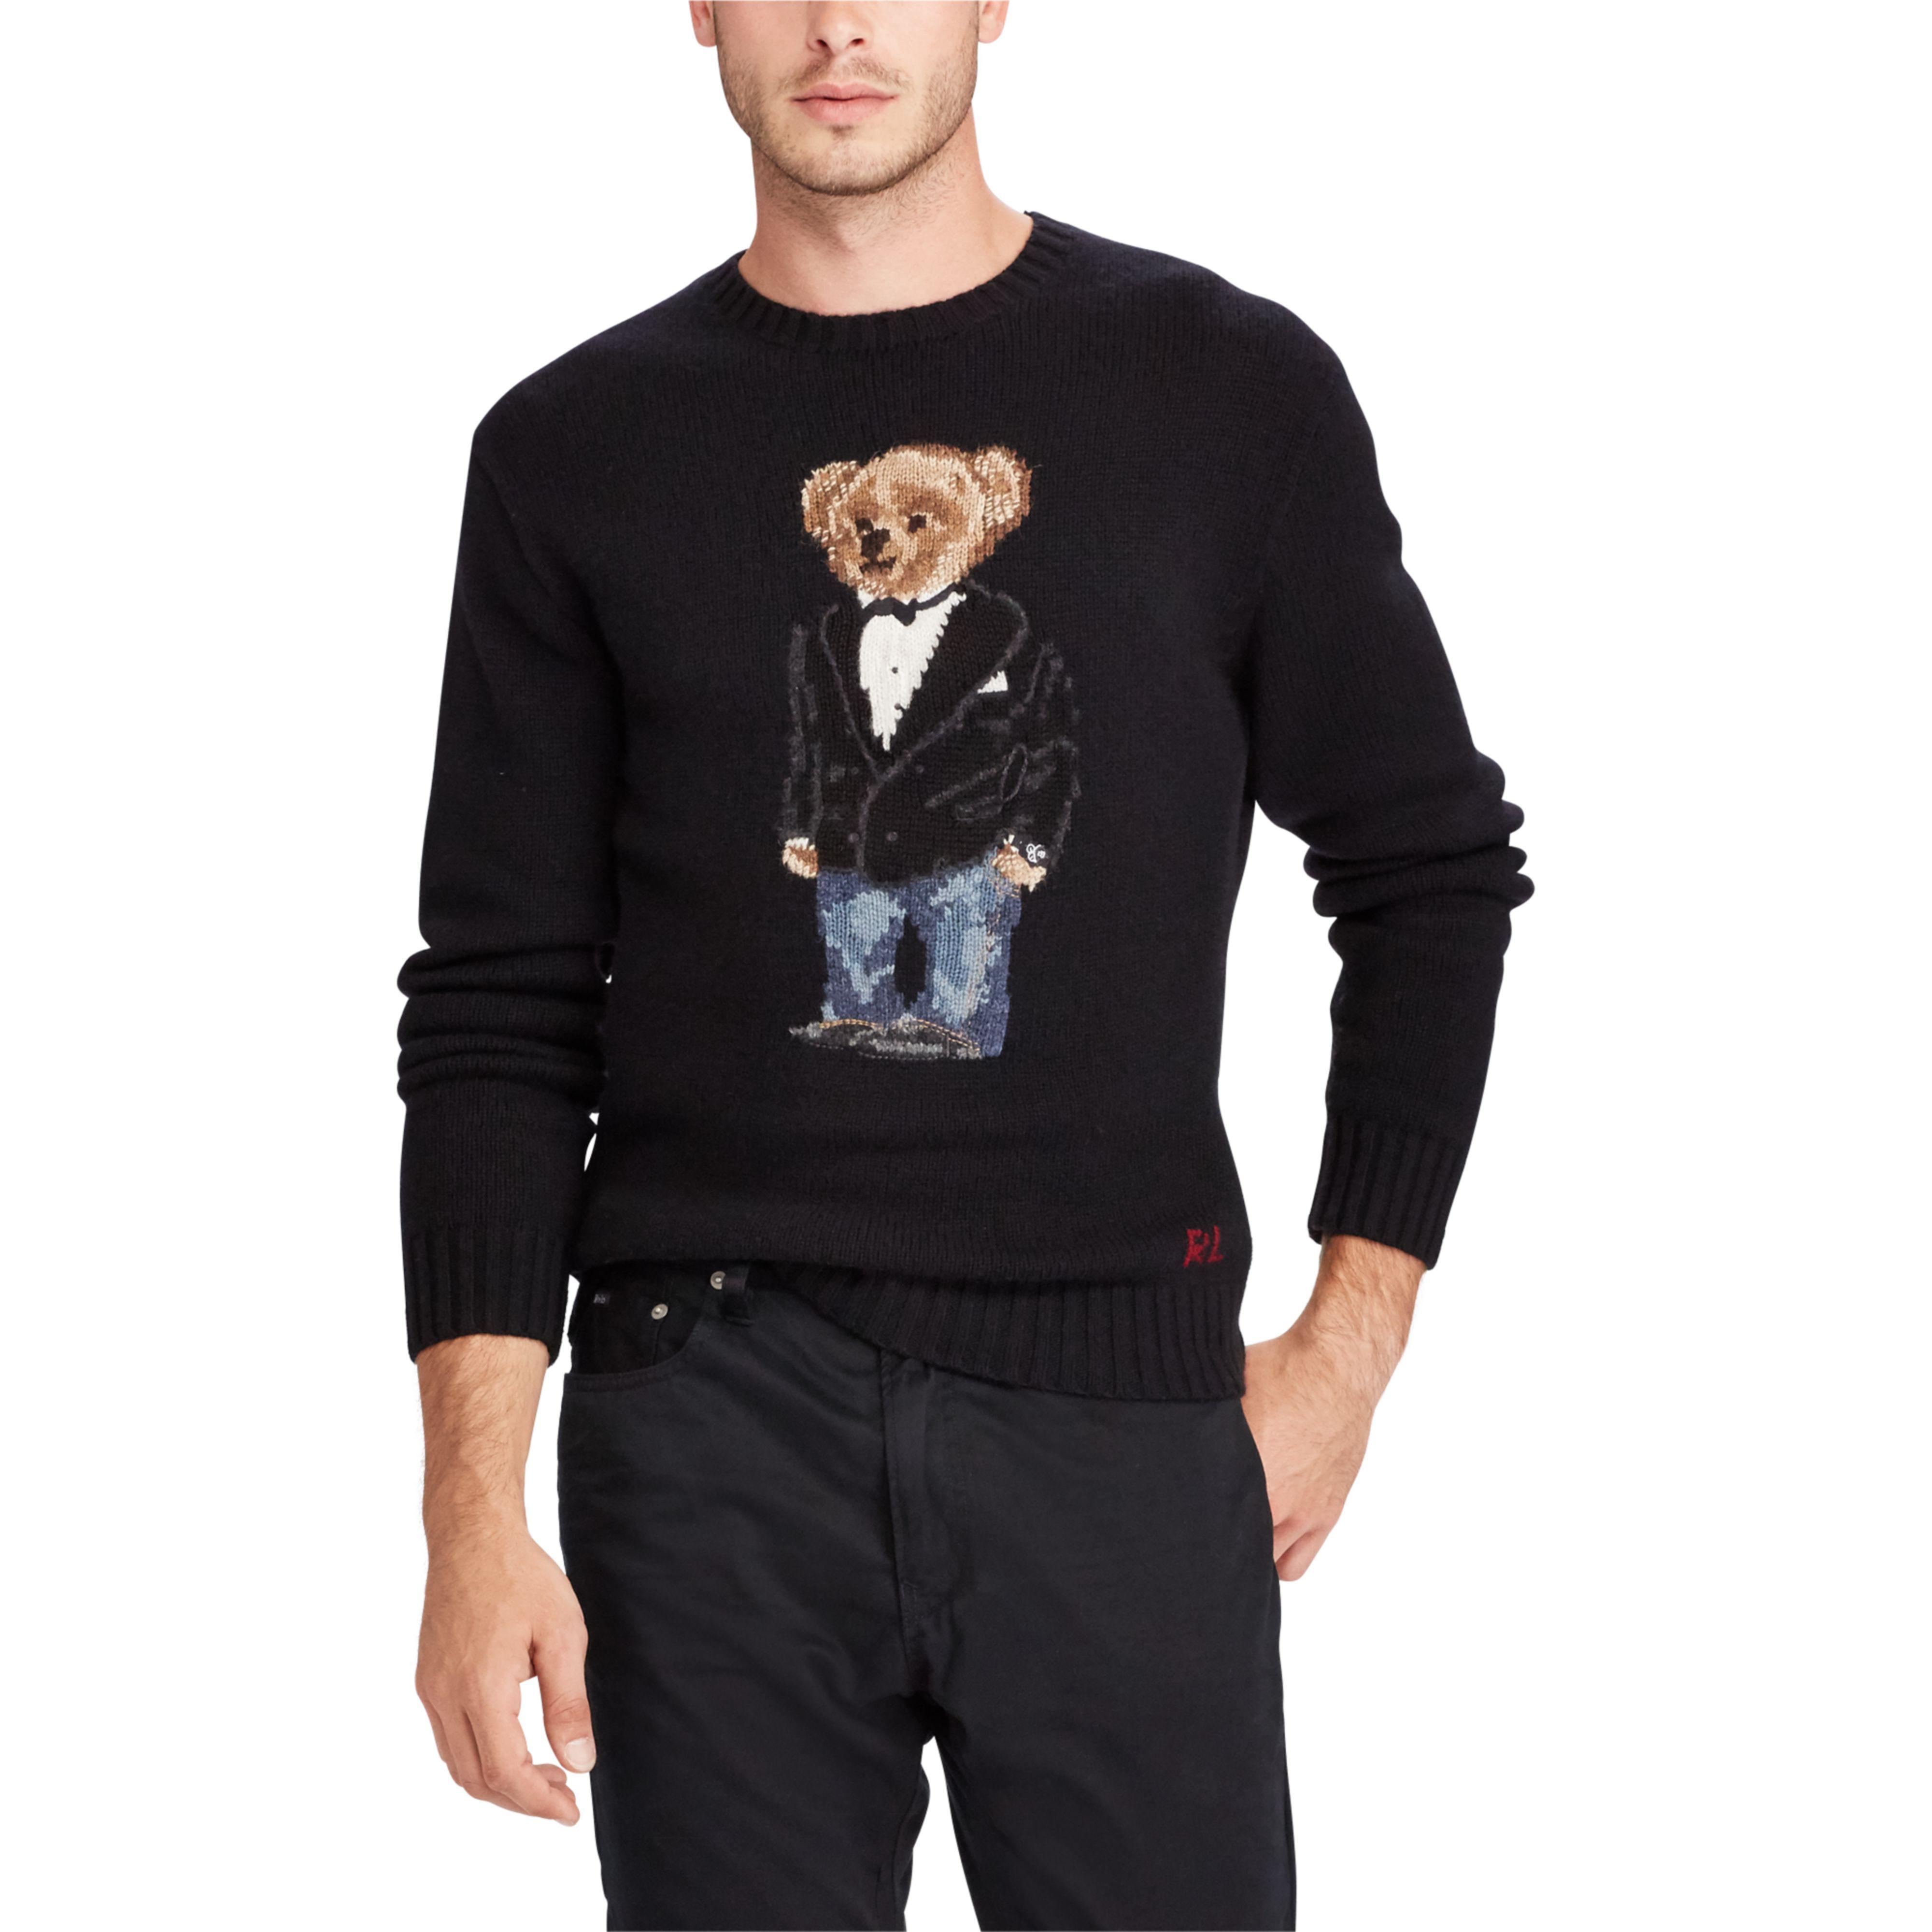 Polo Bear Men Ralph For Tuxedo Black Jumper Wool Lauren UqGLMpjzVS